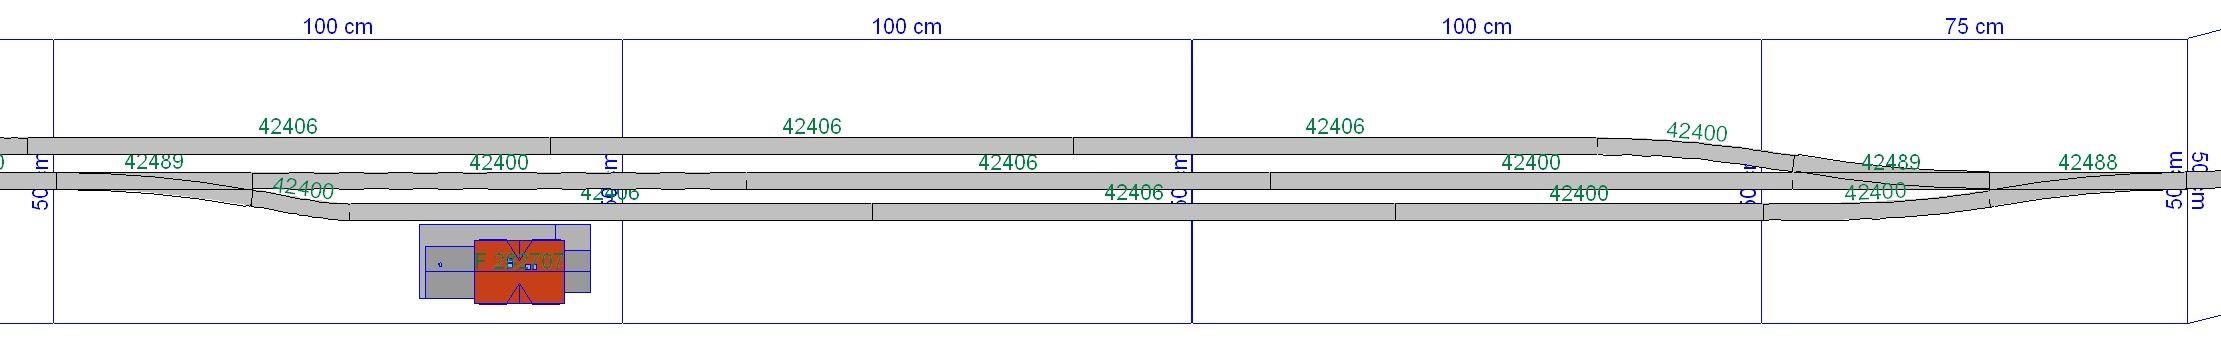 modul6_3_meglevo.jpg